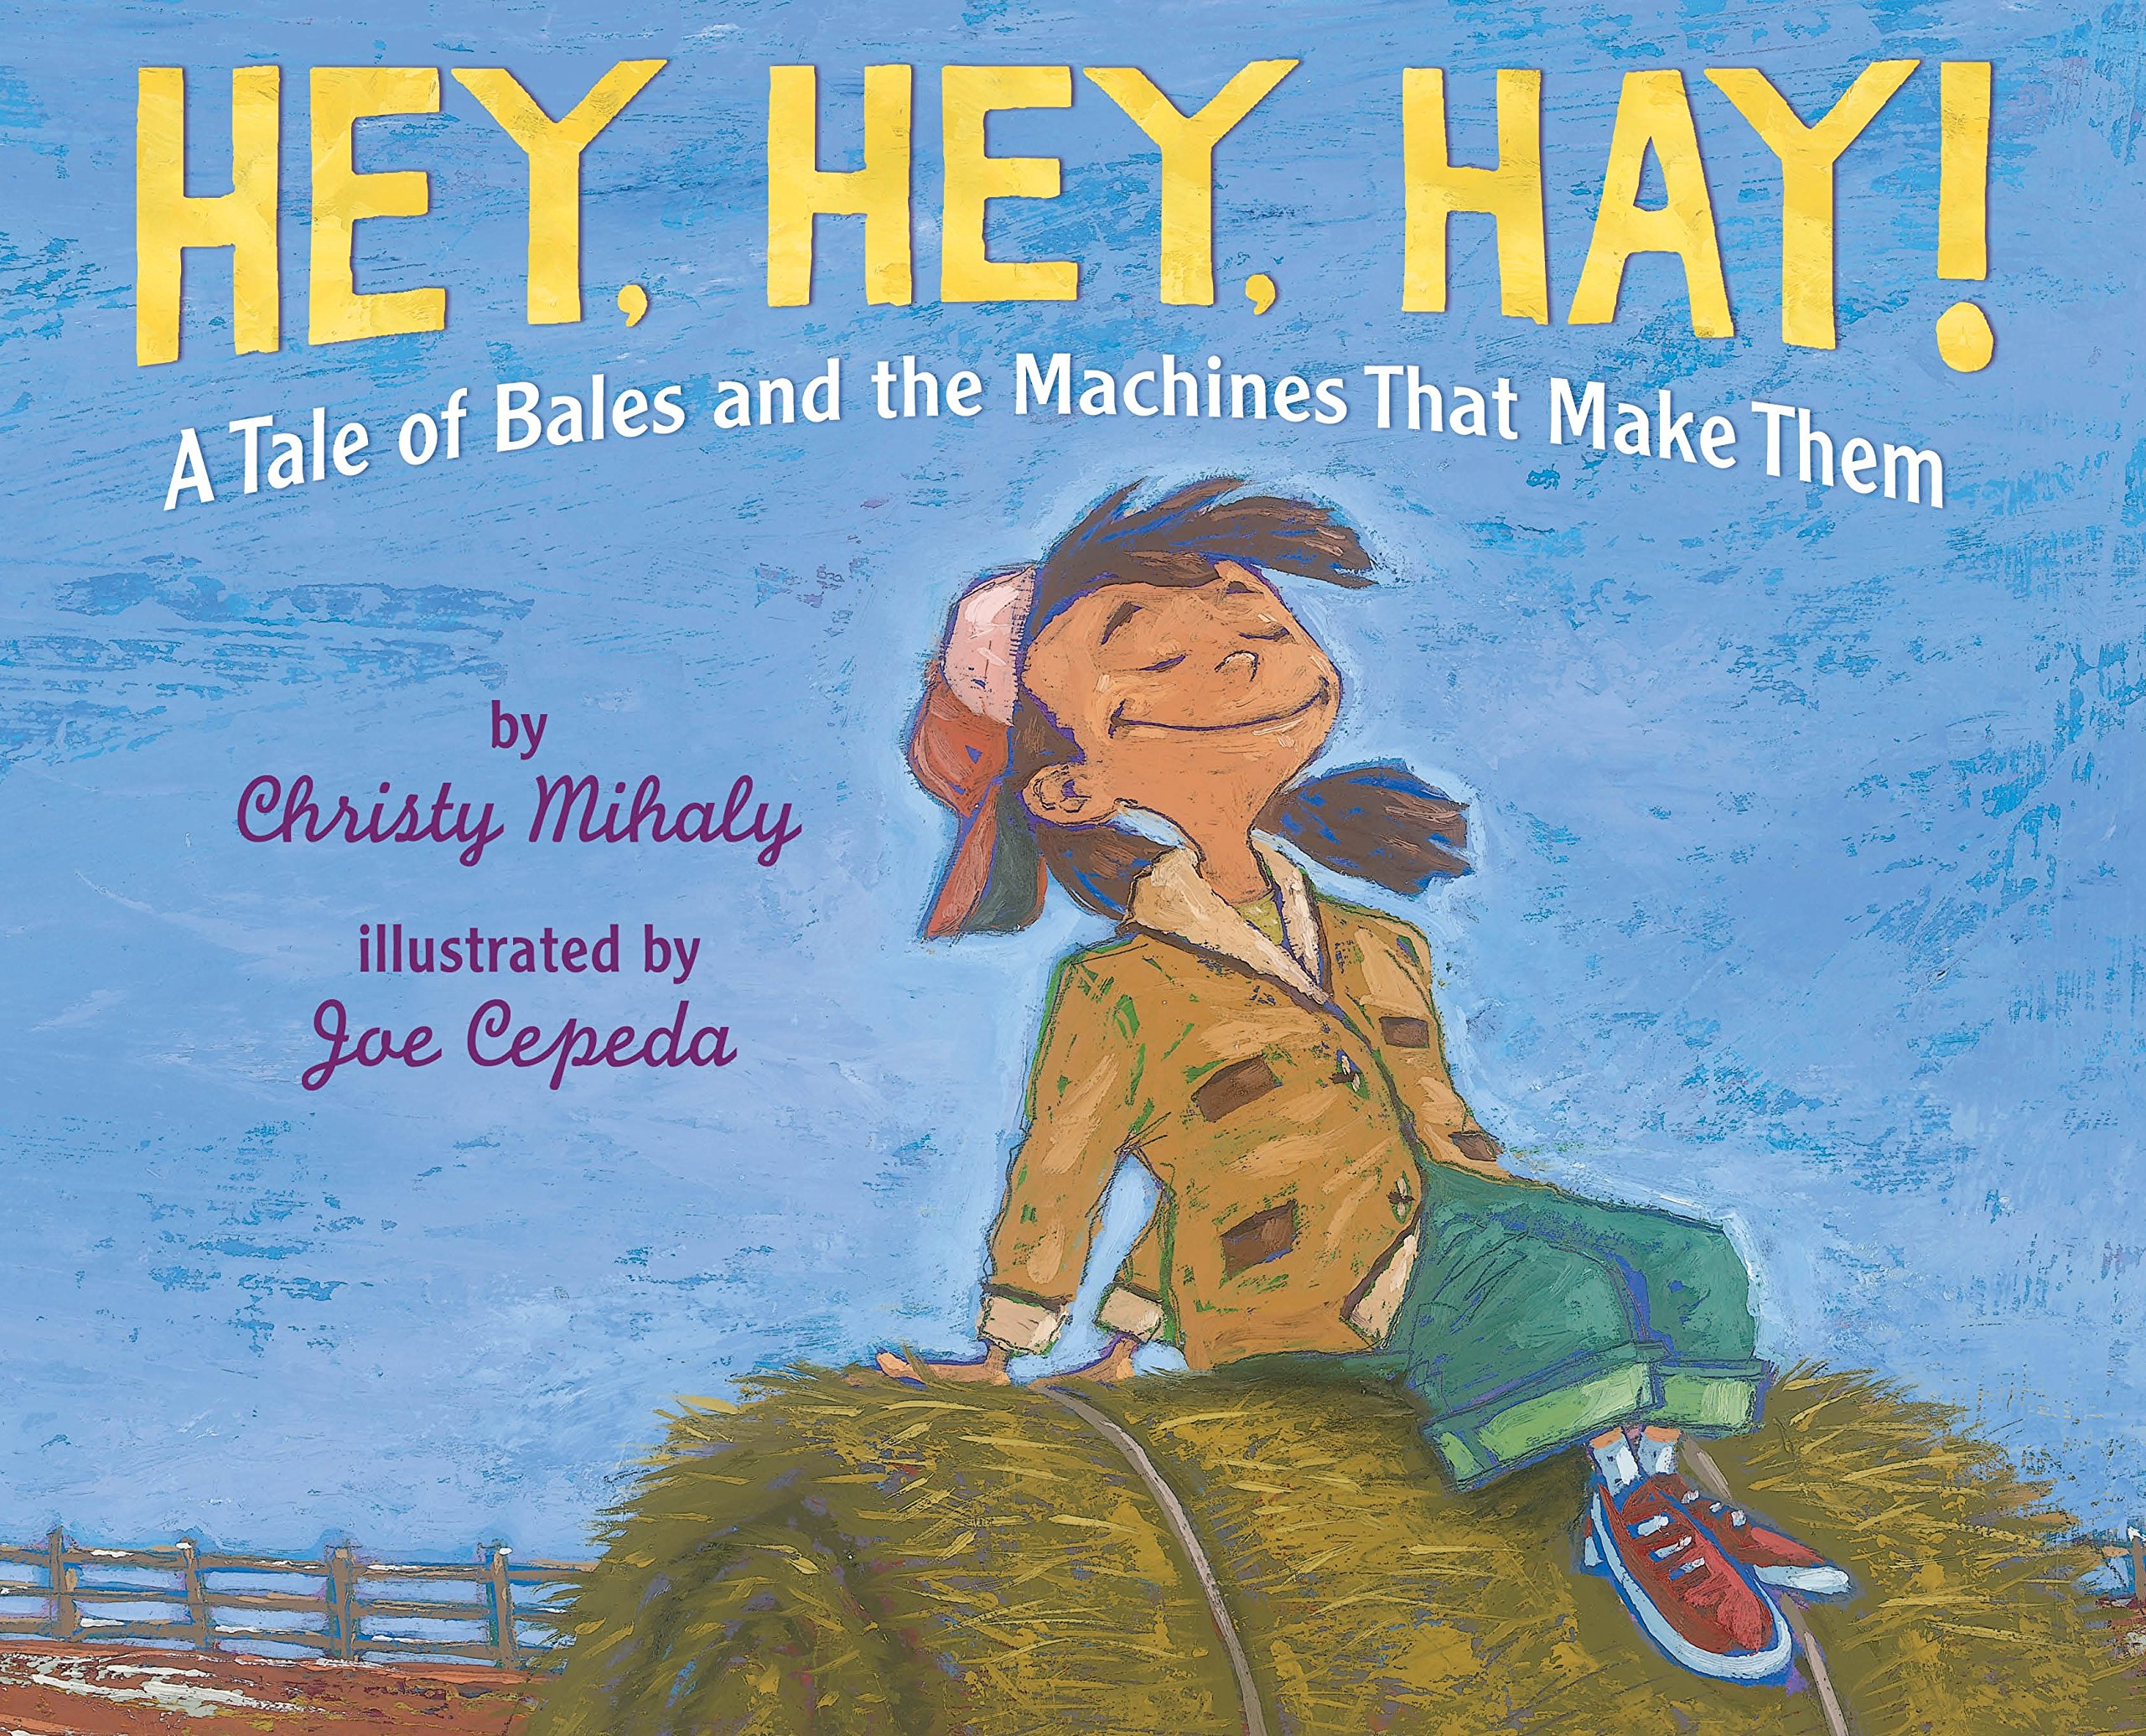 Hey, Hey, Hay! by Holiday House (Image #2)